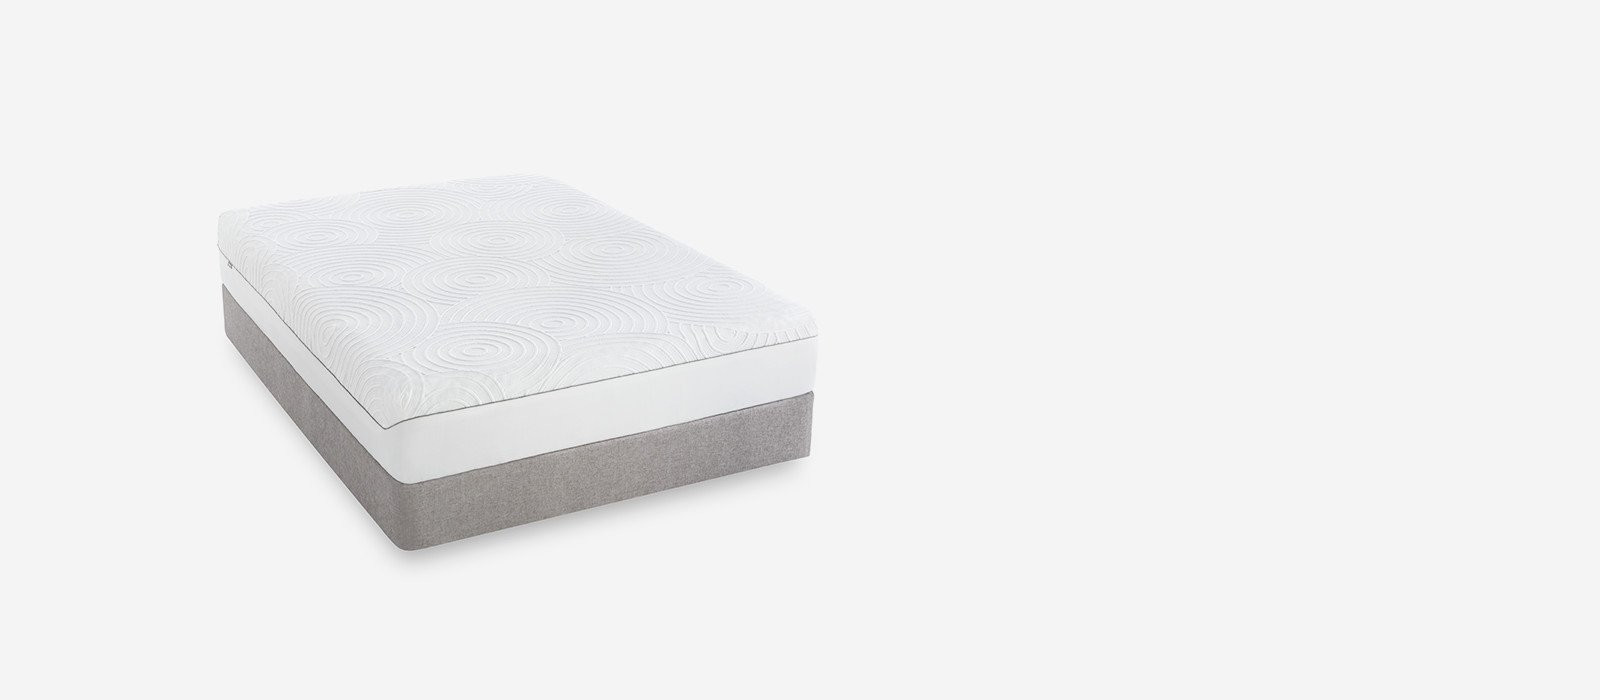 sale retailer 9ff32 c0219 TEMPUR-Protect Mattress Protector